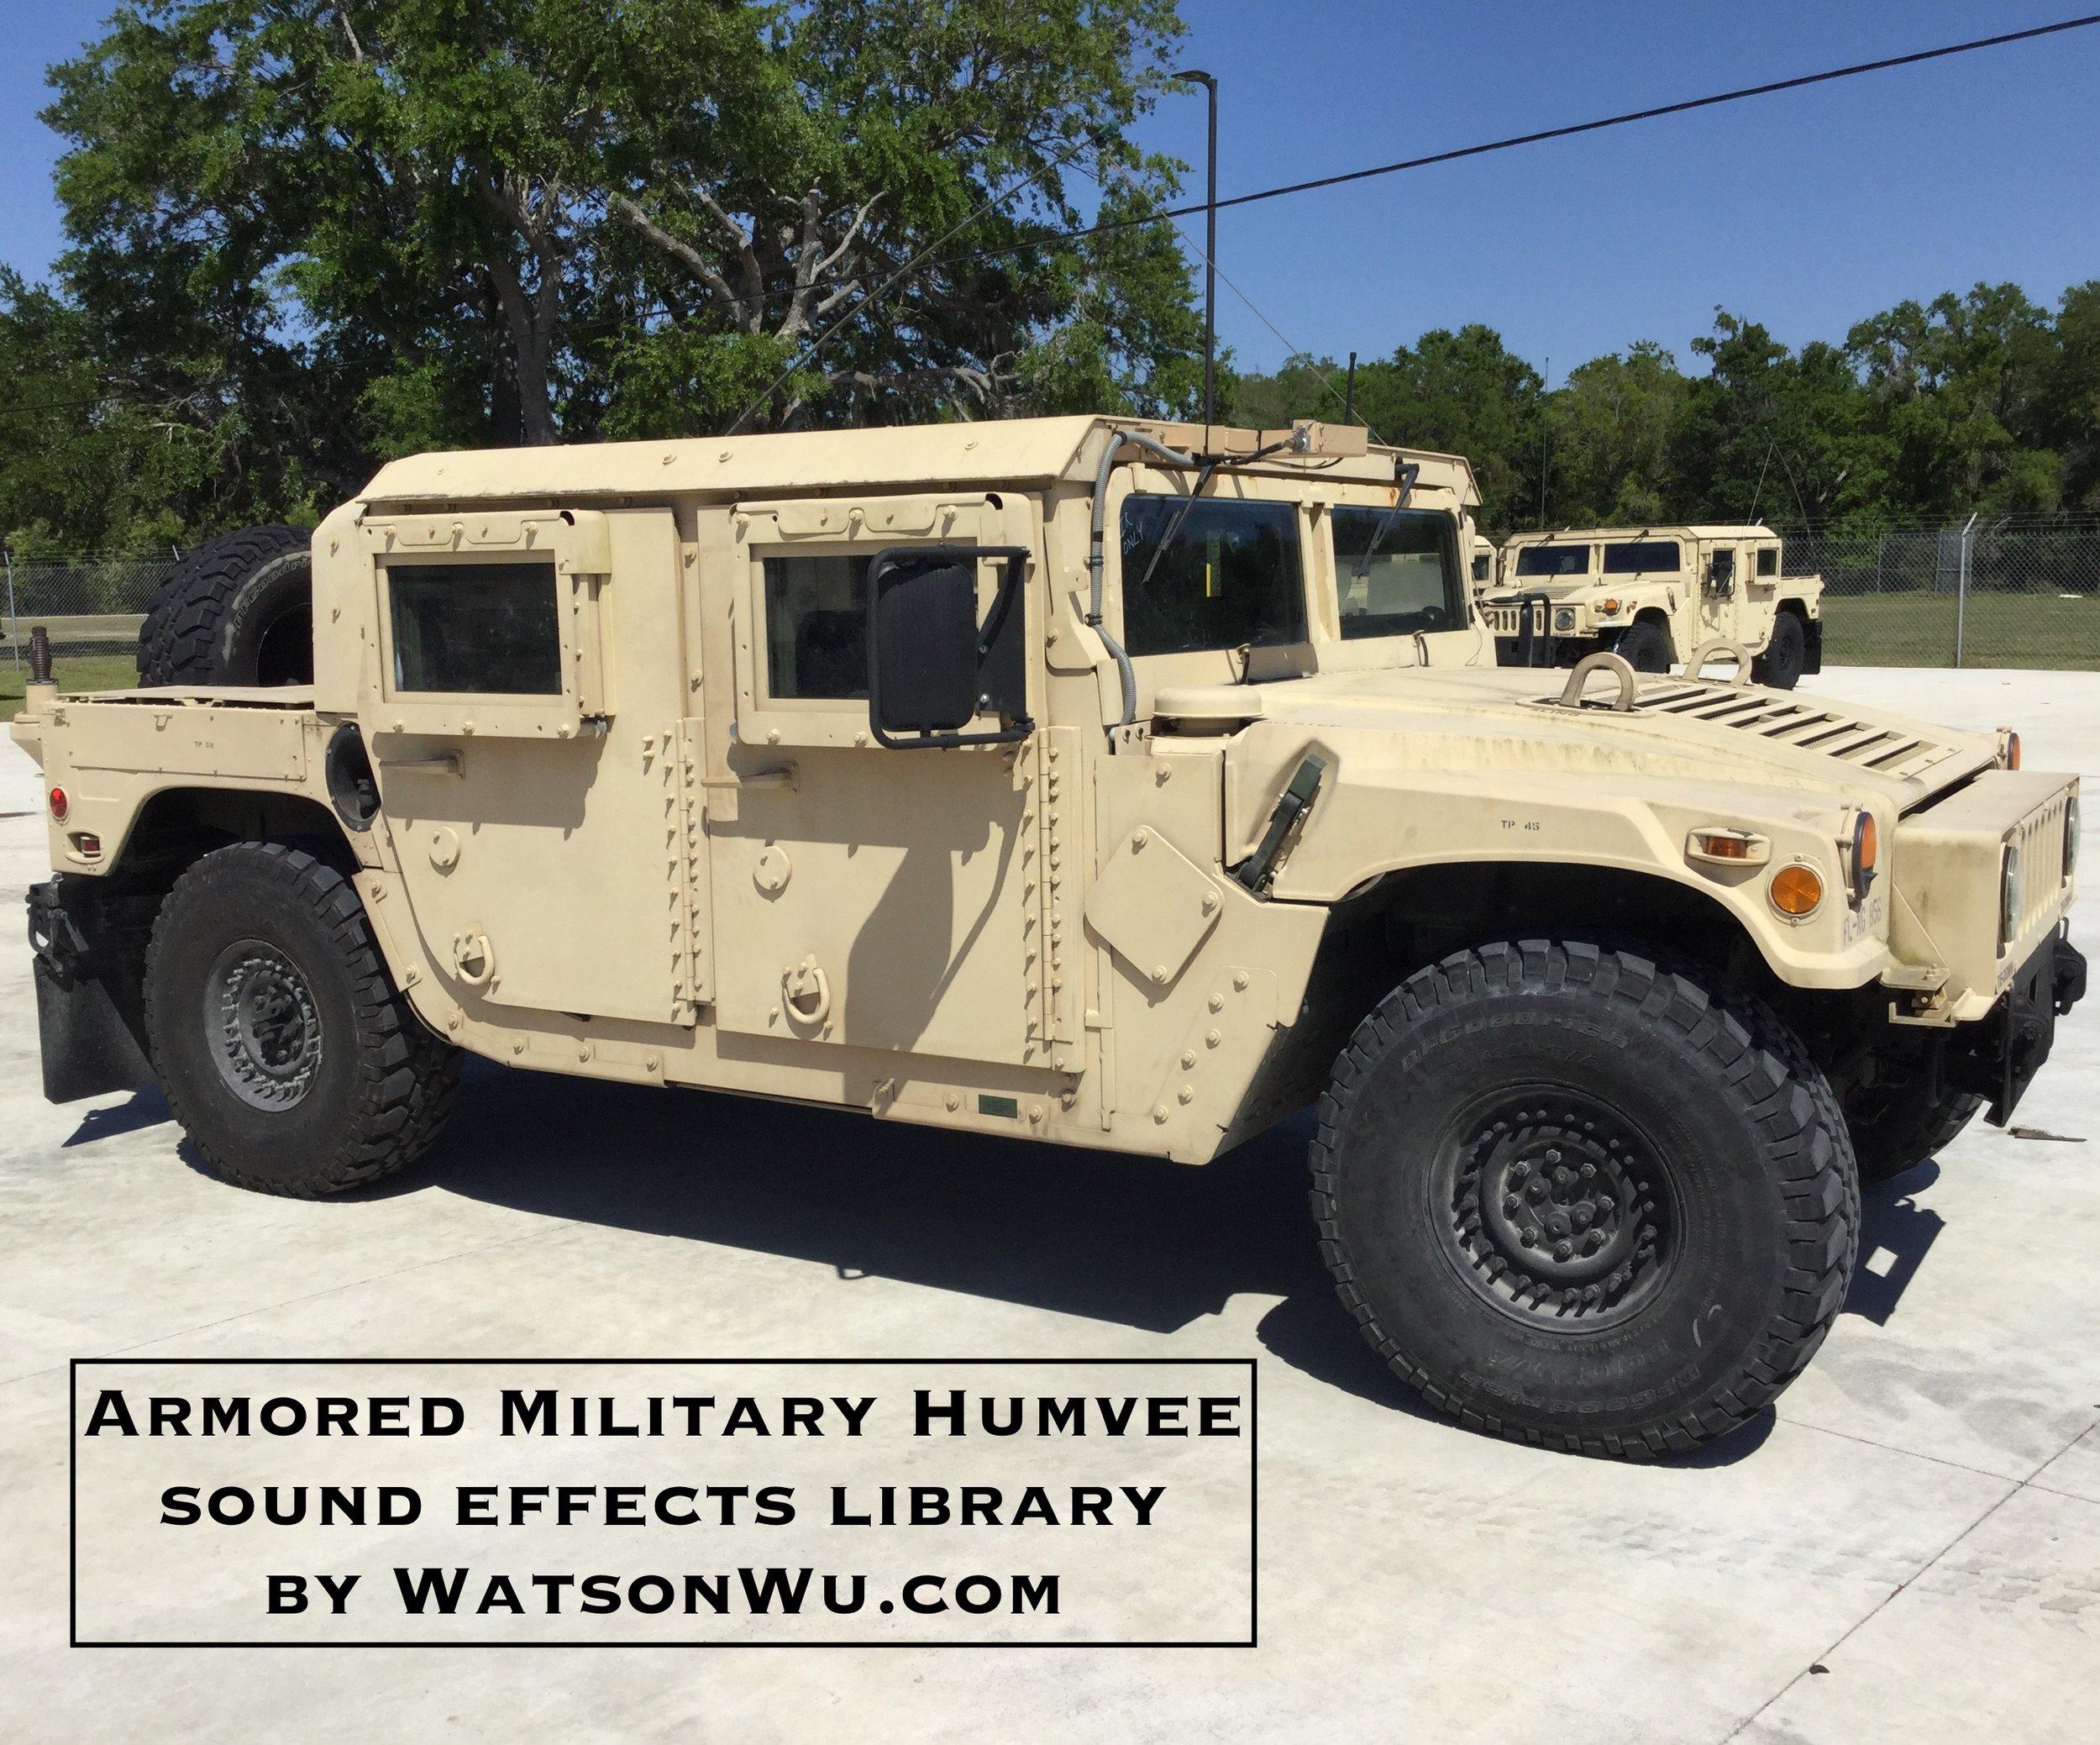 Military Humvee sfx library by WatsonWu.com text.JPG